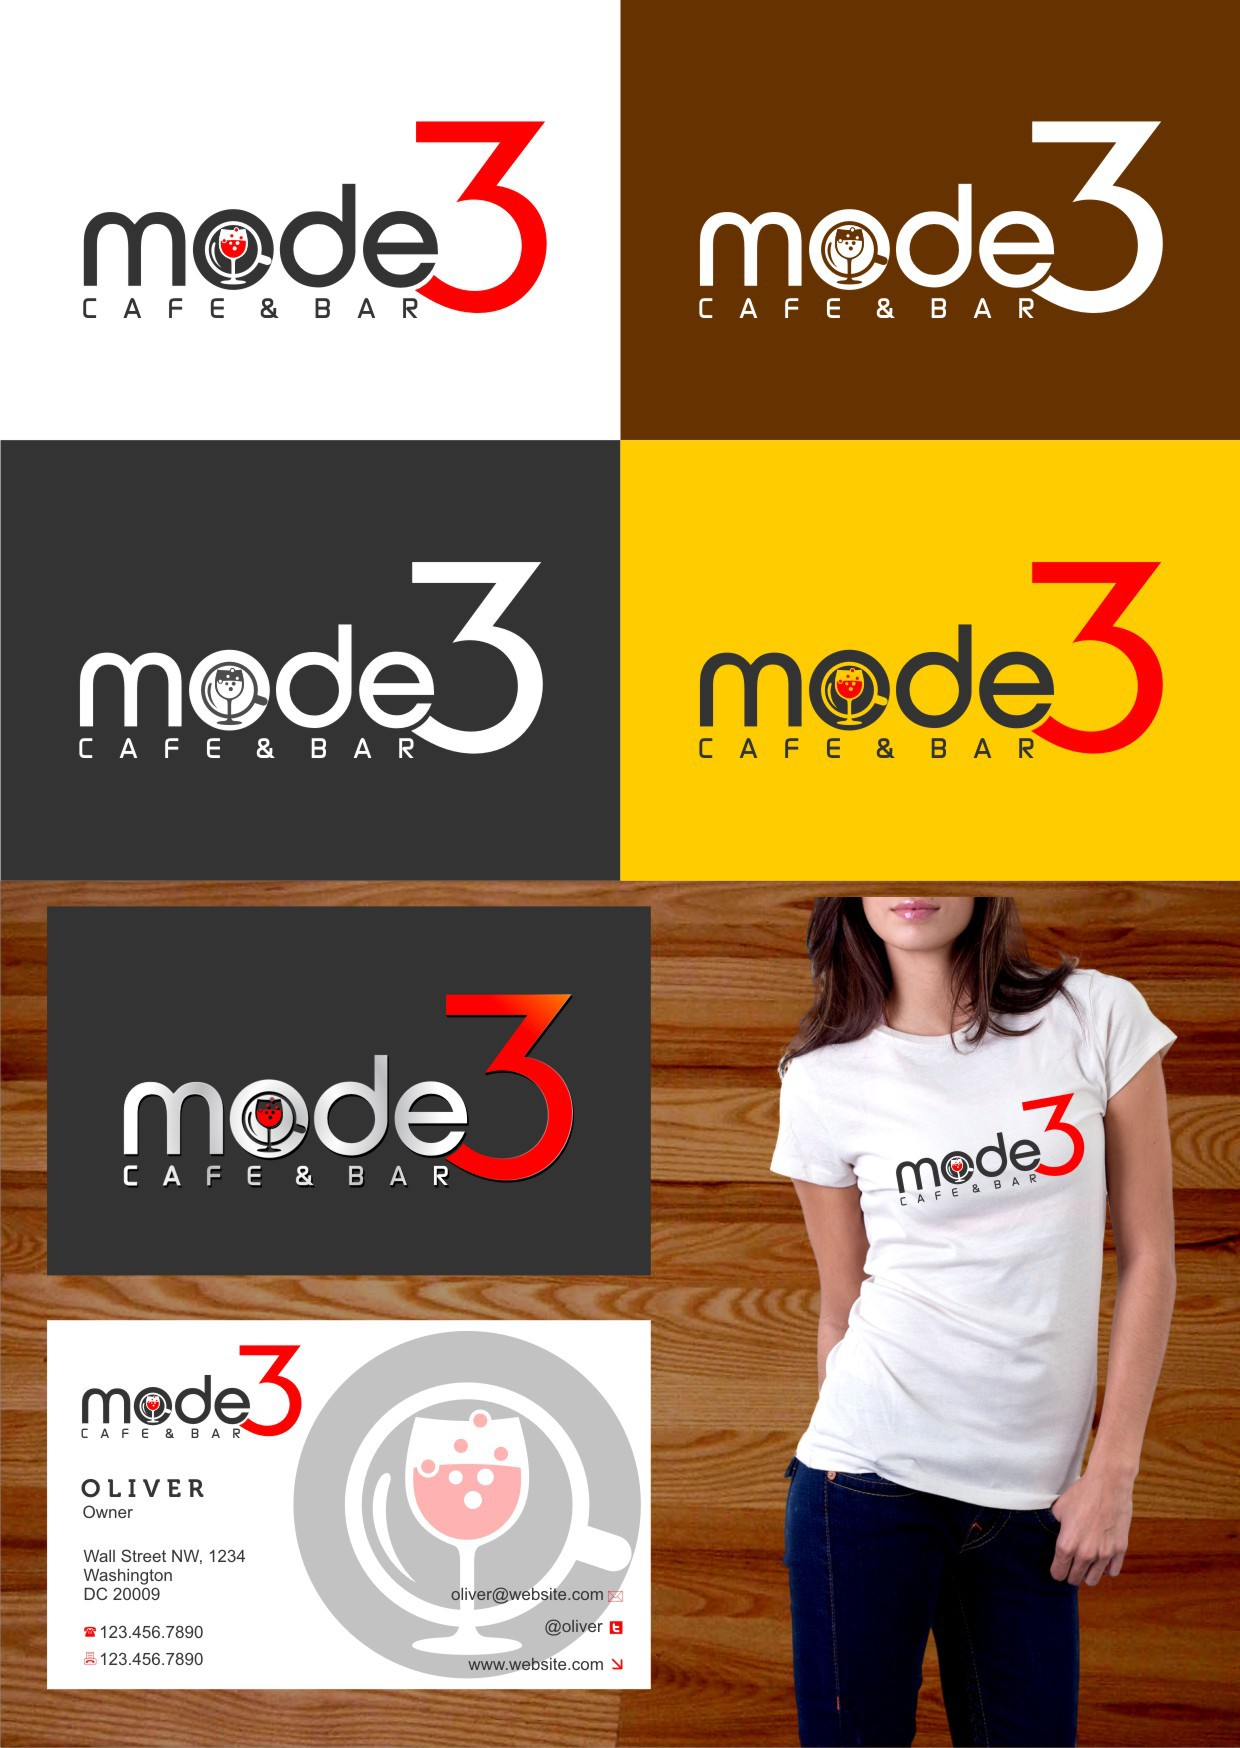 Mode3 Cafe and Bar needs a new logo